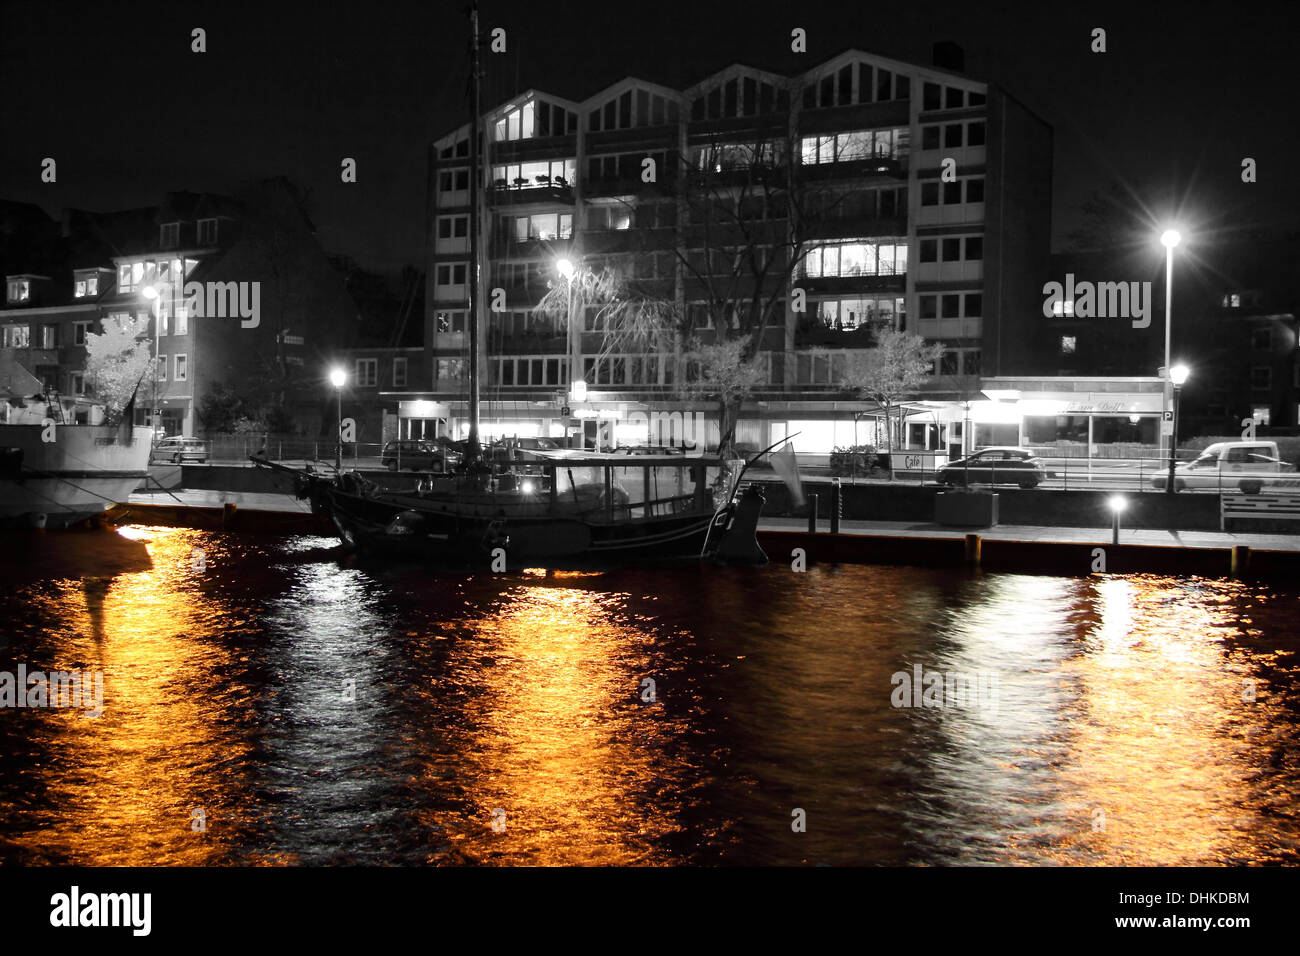 Age inland port at night - Stock Image